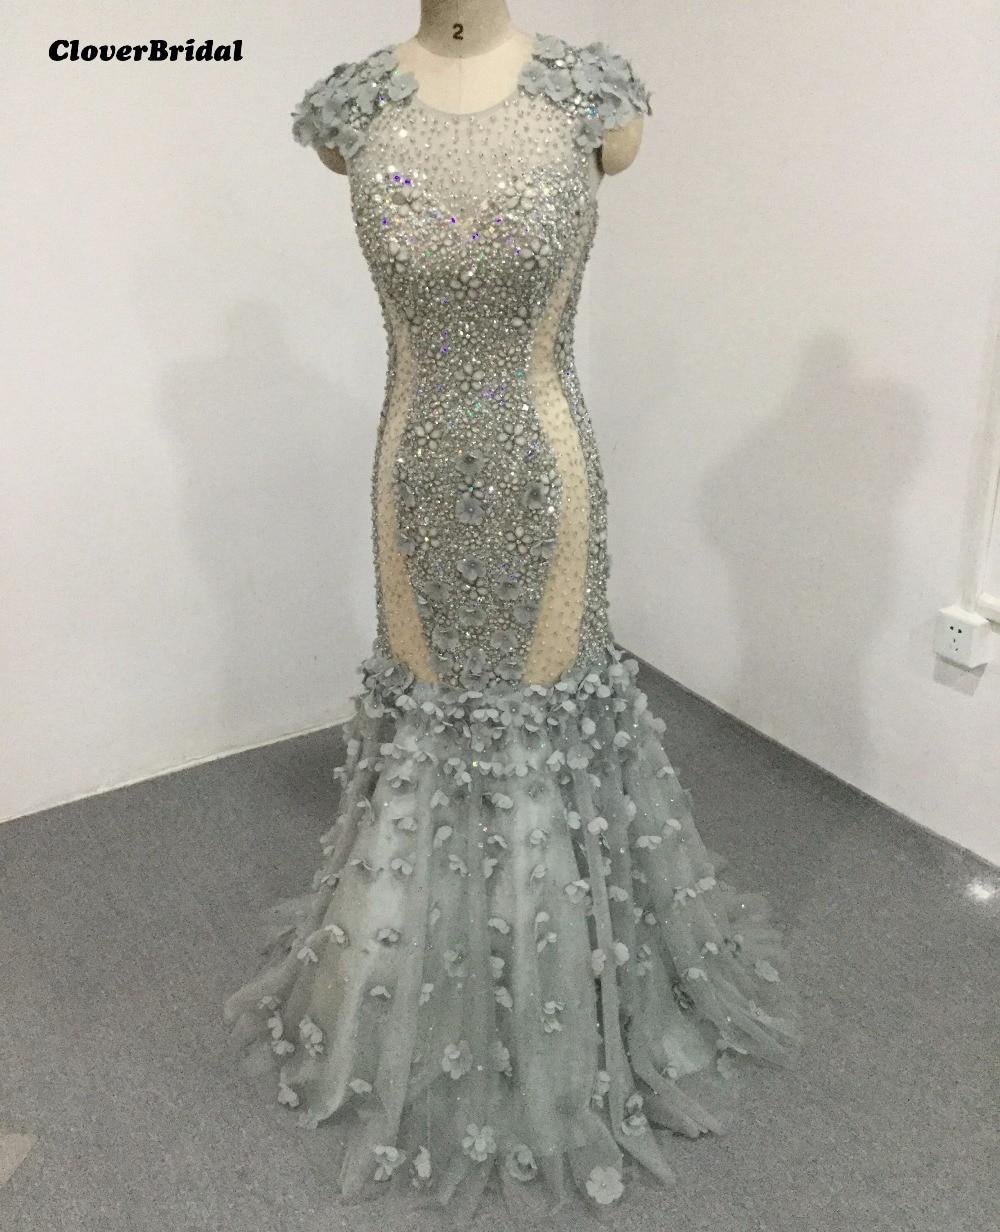 CloverBridal alta qualidade sparkly pedras lantejoulas pérolas cinza  beading sereia vestido de noite 2017 cap floral 26ca3783f5c